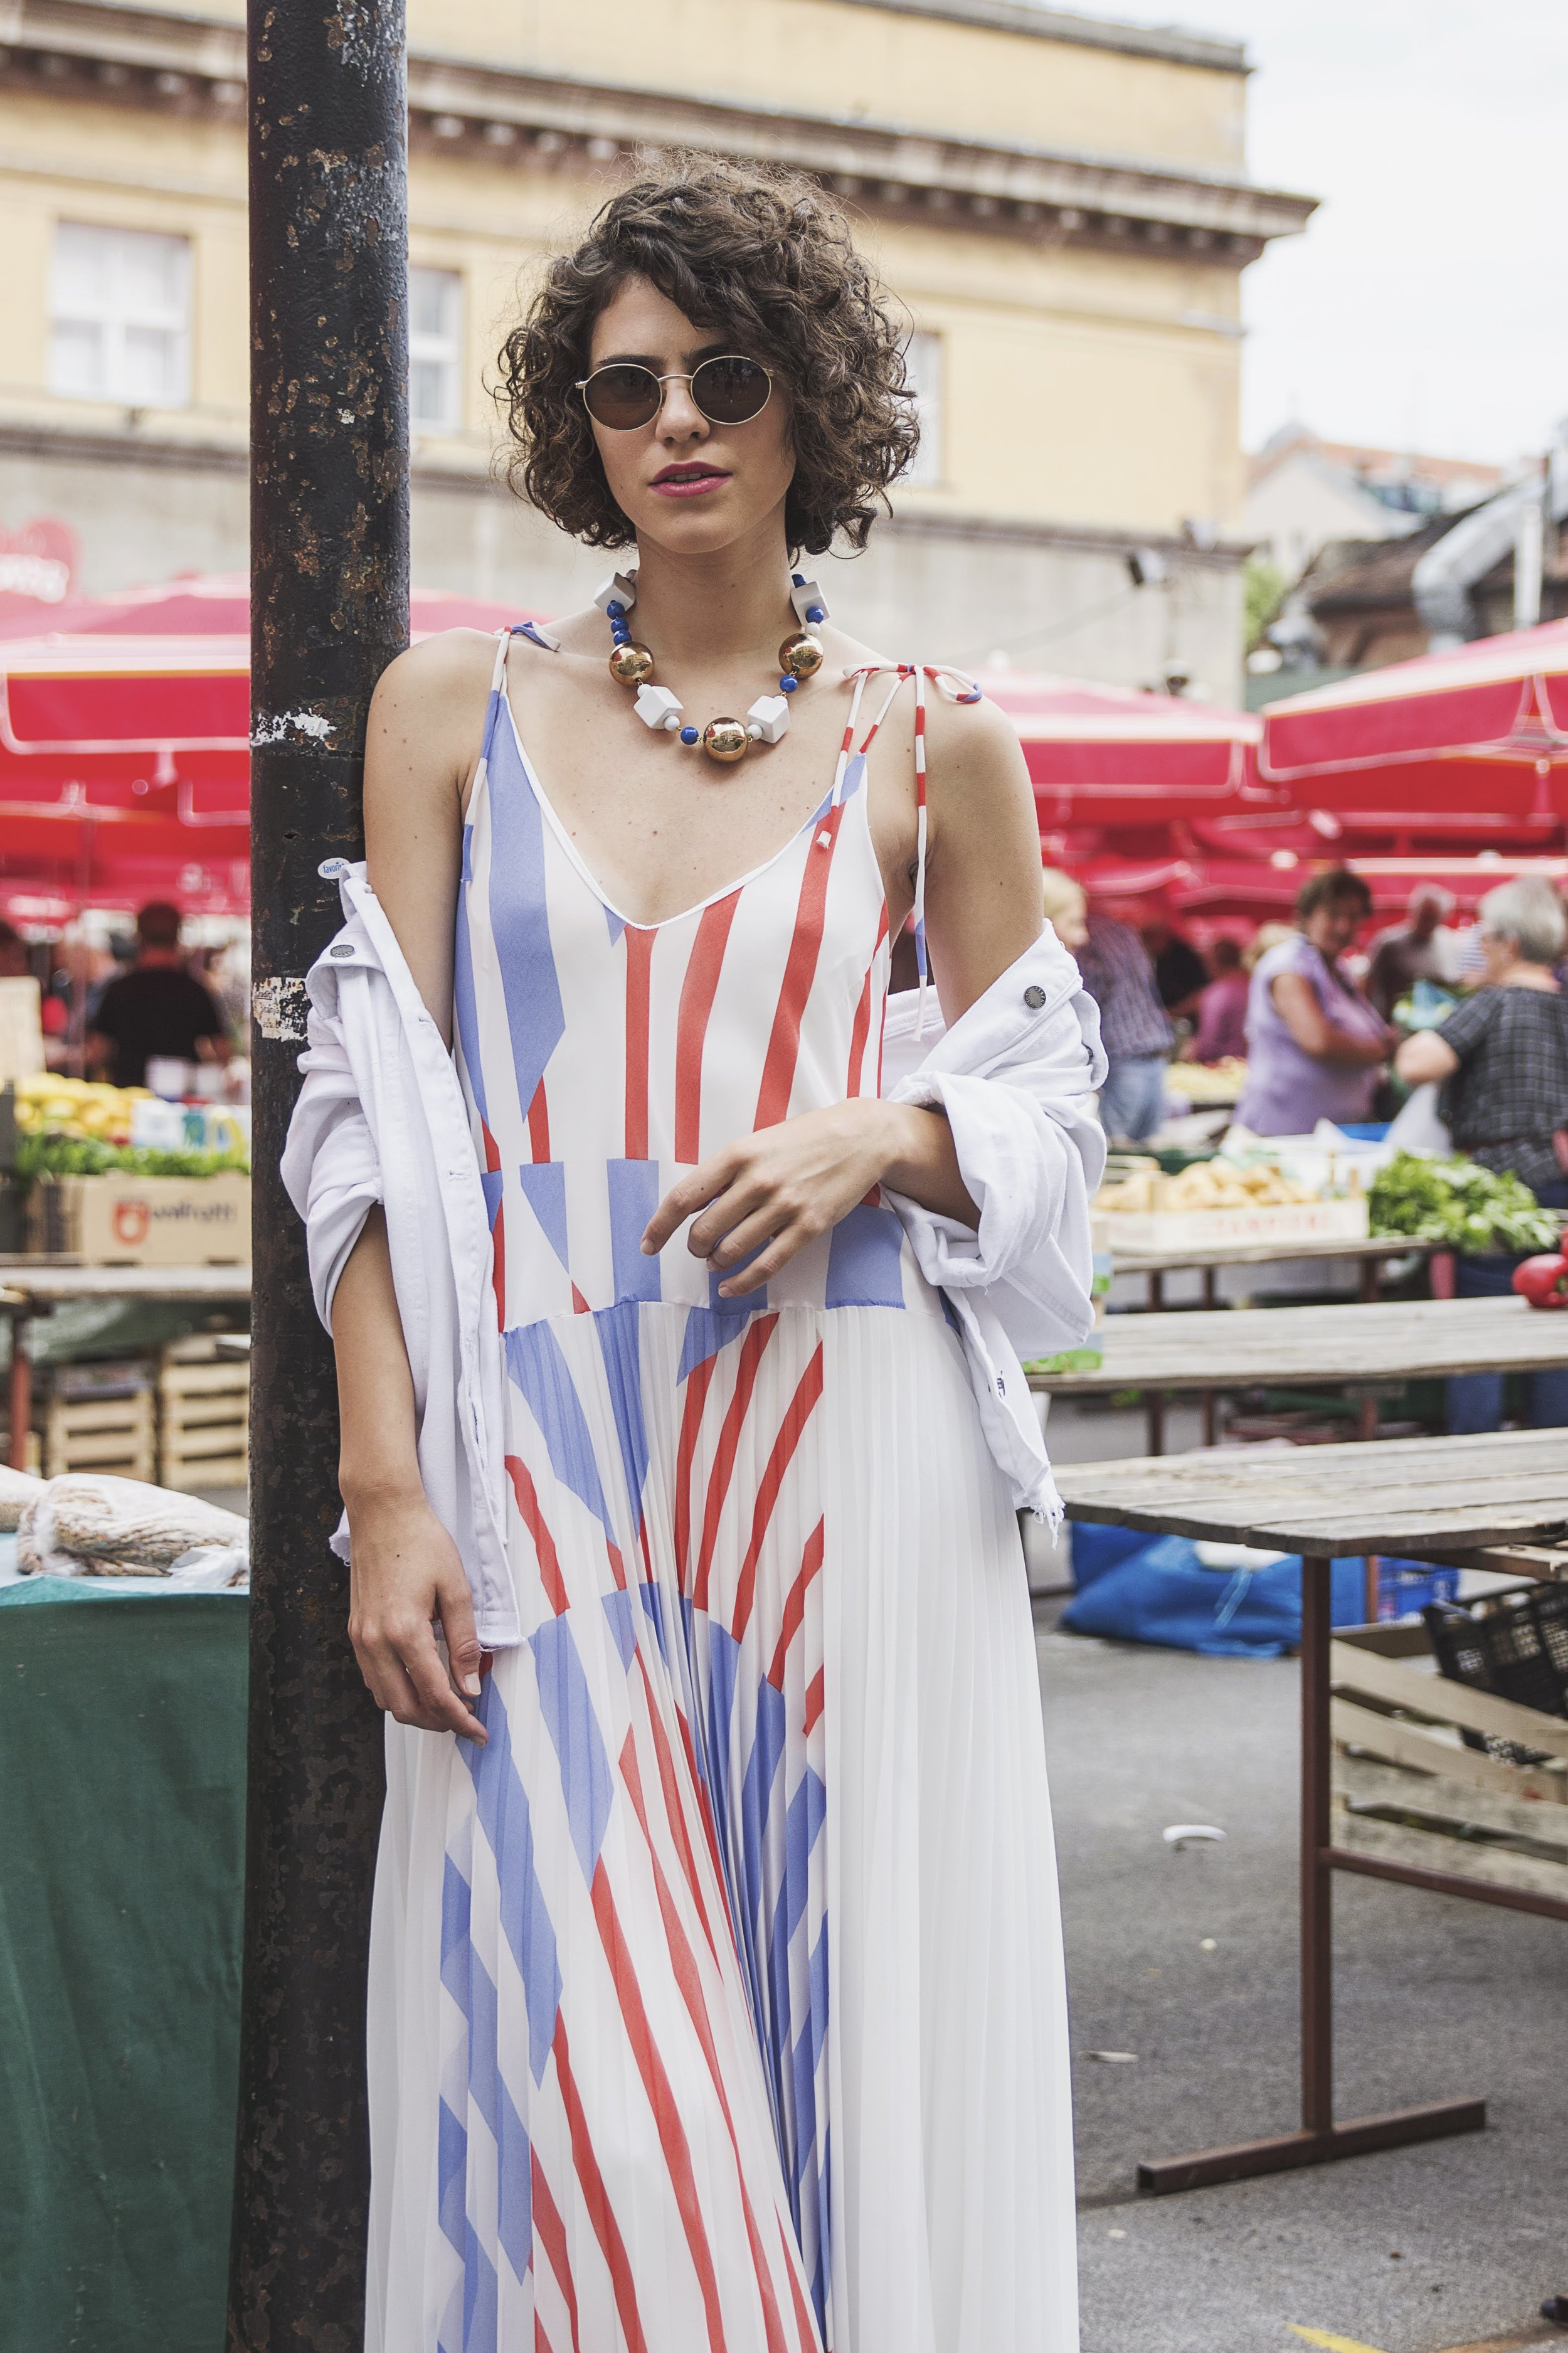 luka-lajic-fashion-photography-robert-sever-dizajner-croatian (10).jpg